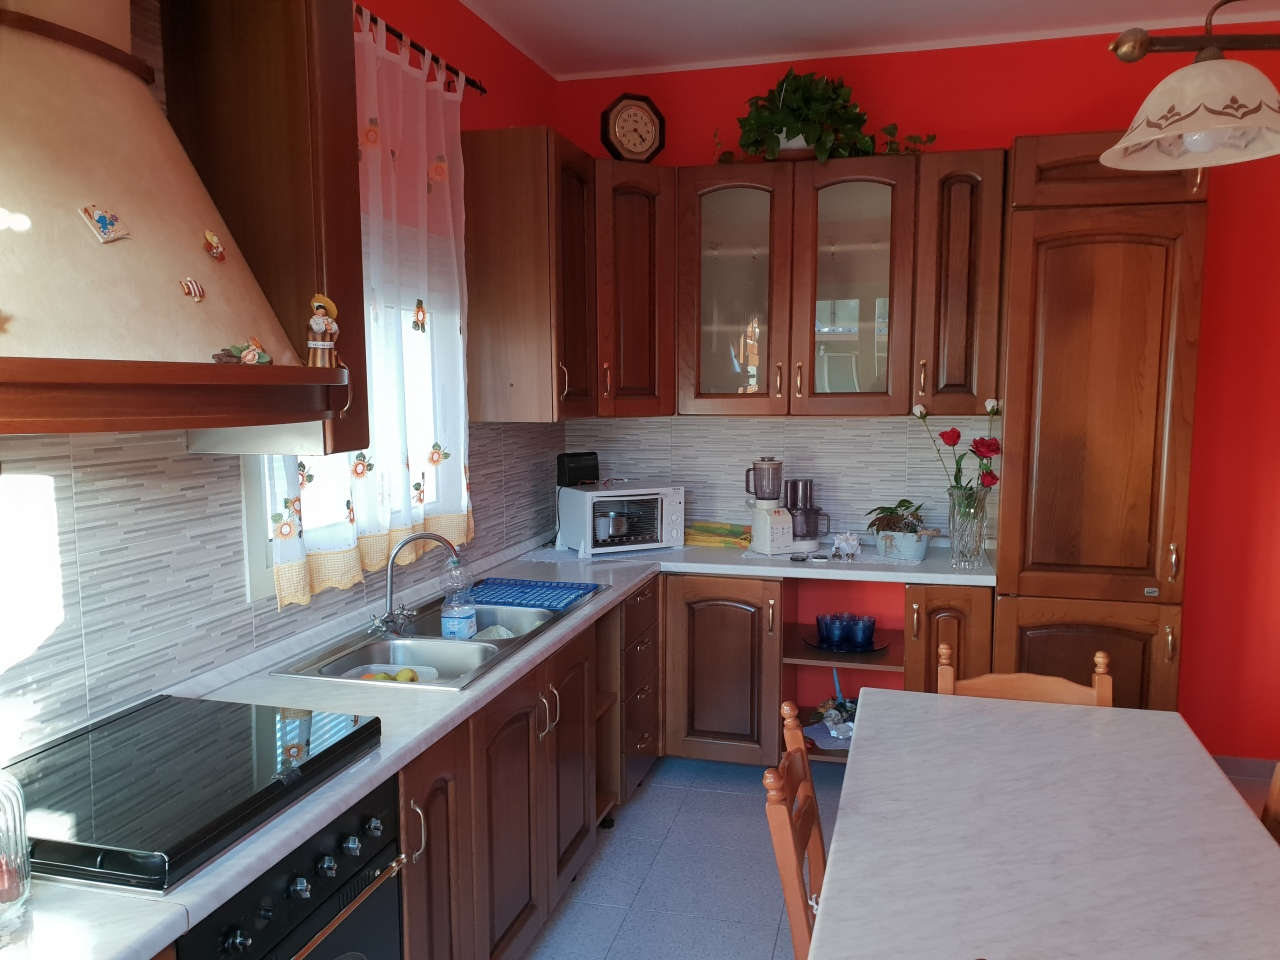 siracusa vendita quart: arenella-plemmirio-fanusa-terrauzza schiavone immobiliare